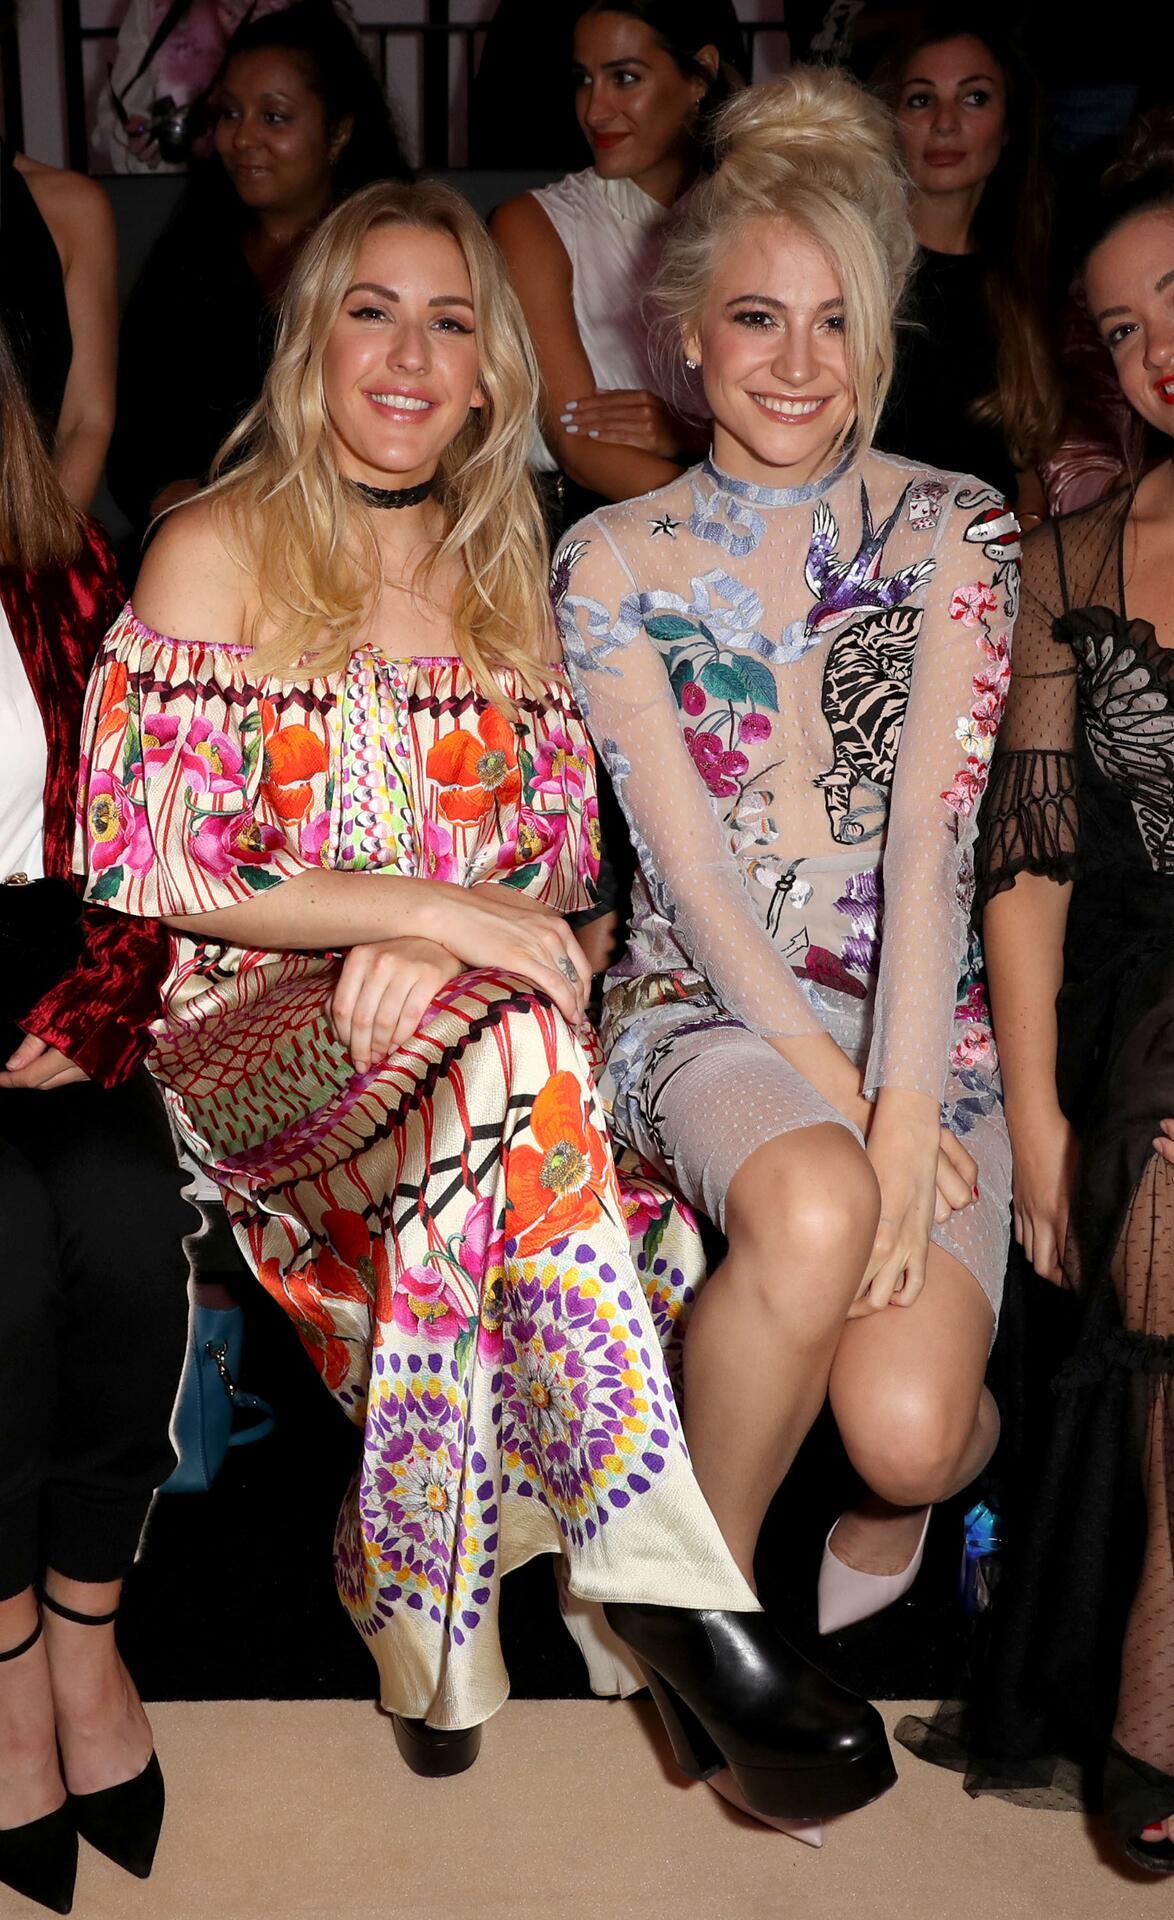 Bild zu Ellie Goulding, Pixie Lott, London Fashion Week